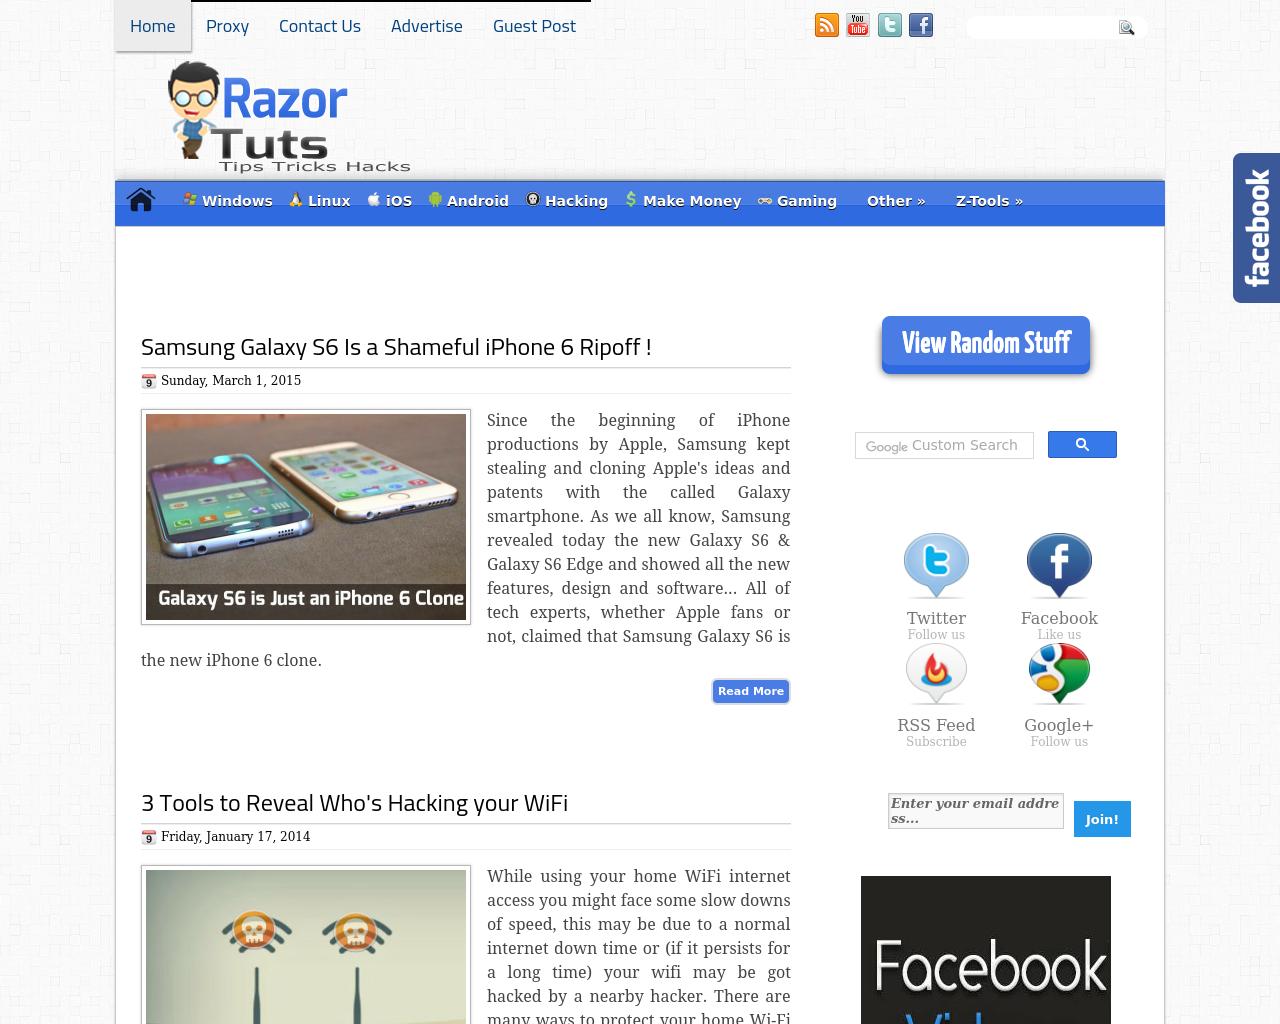 Razor-Tuts-Advertising-Reviews-Pricing